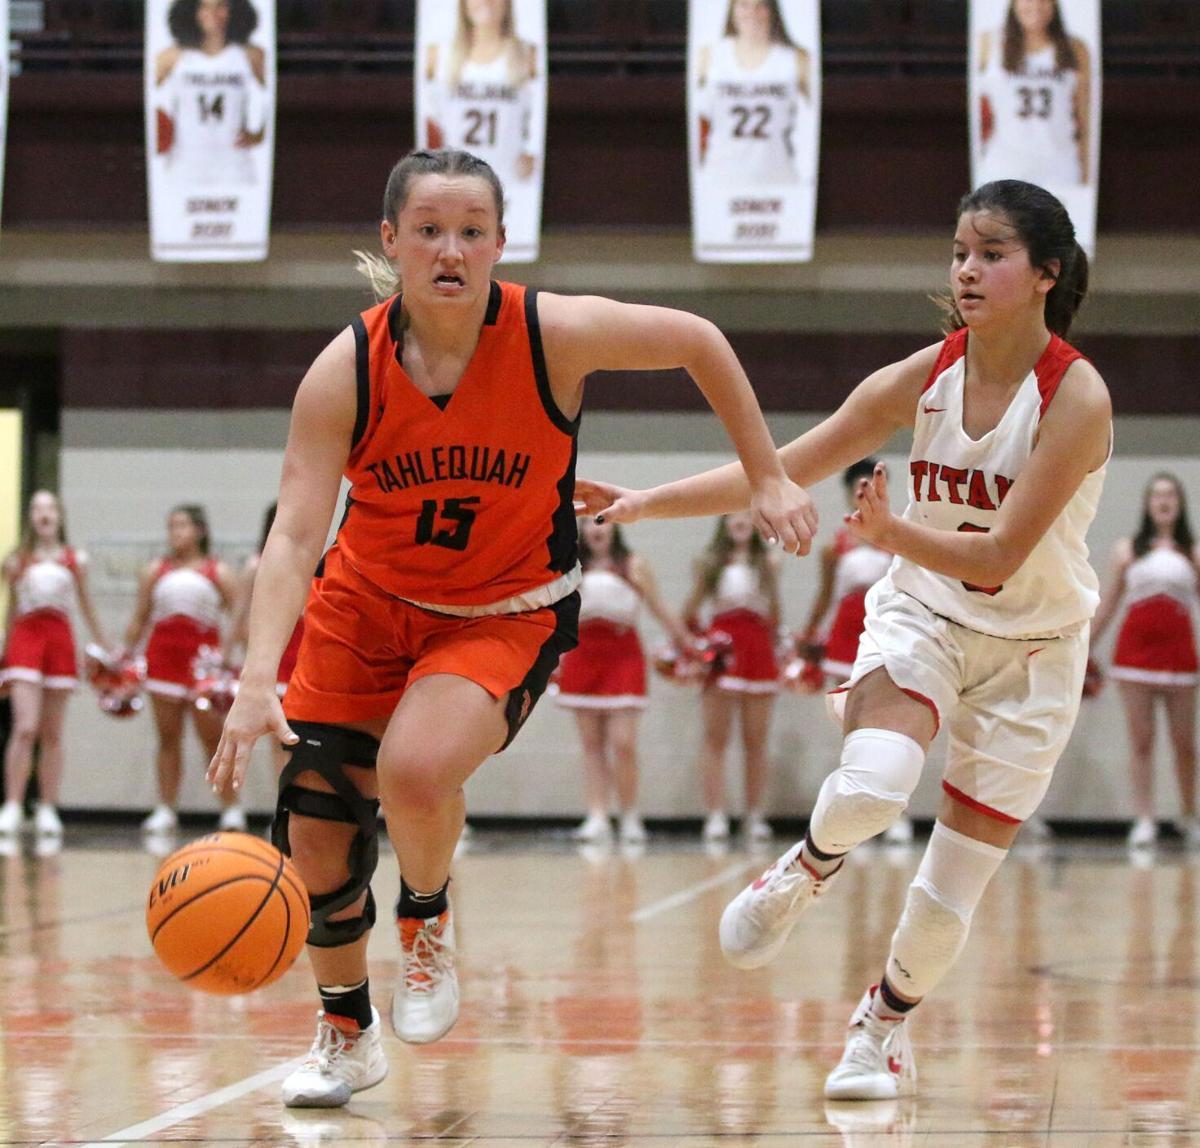 LOOKING AHEAD: Tigers, Lady Tigers open basketball season on Dec. 1